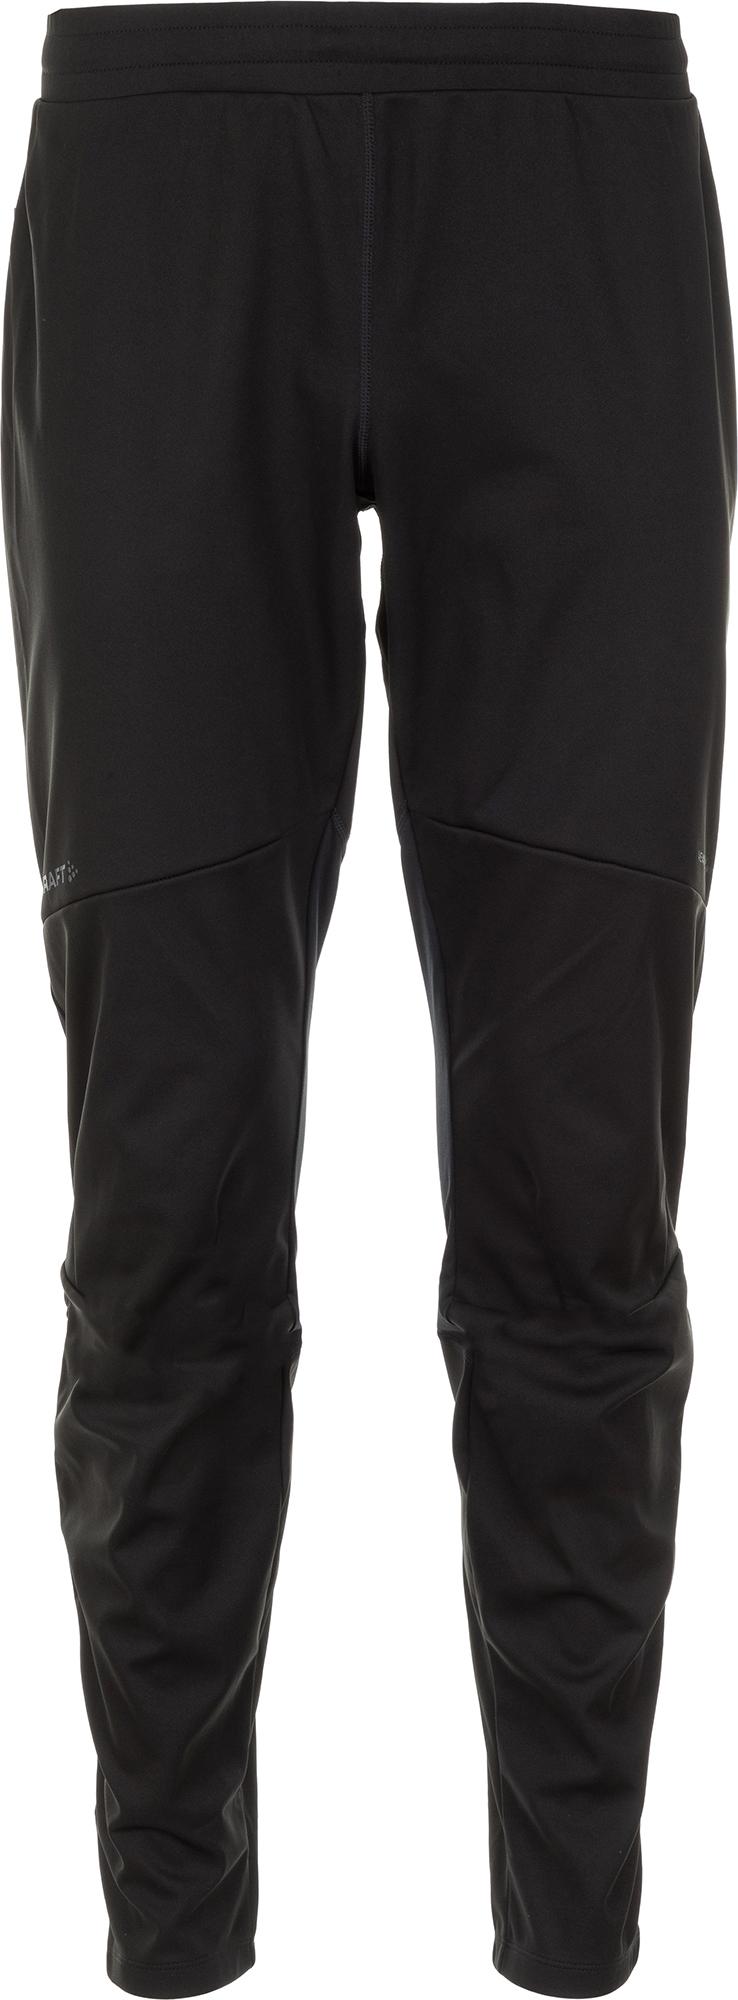 Фото - Craft Брюки мужские Craft Glide Pants, размер 46-48 craft шорты мужские craft essence размер 46 48